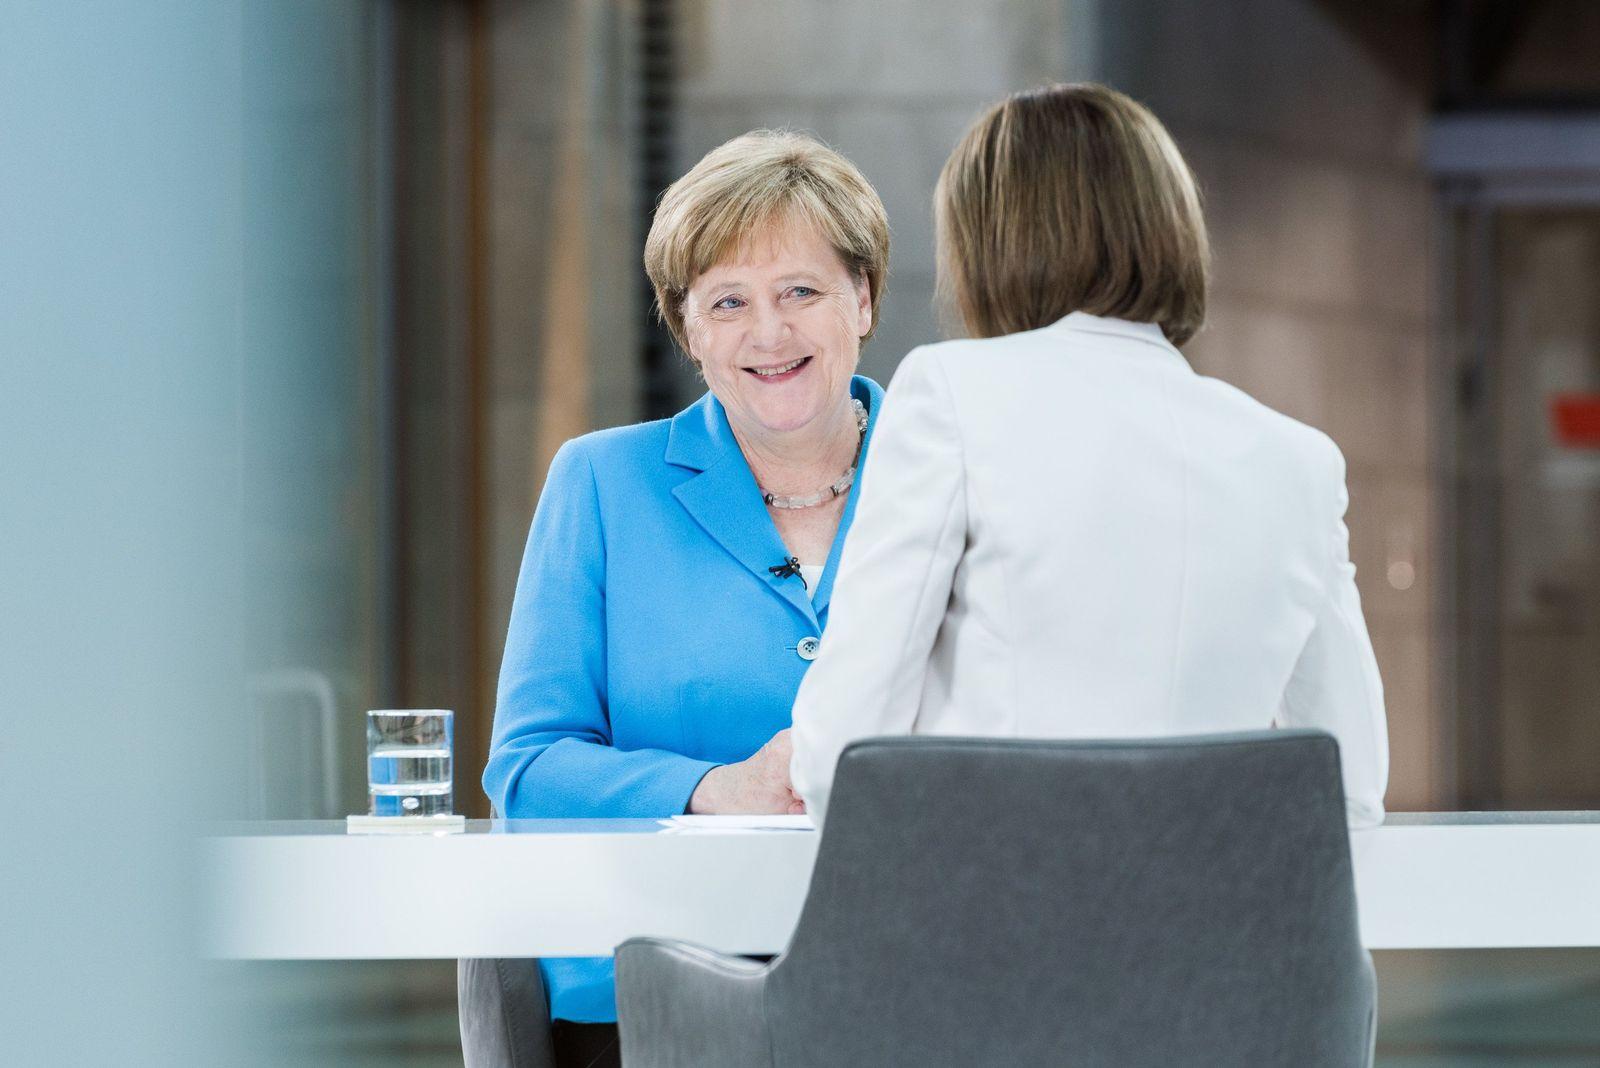 Angela Merkel/ Berlin direkt/ Sommerinterview 2018